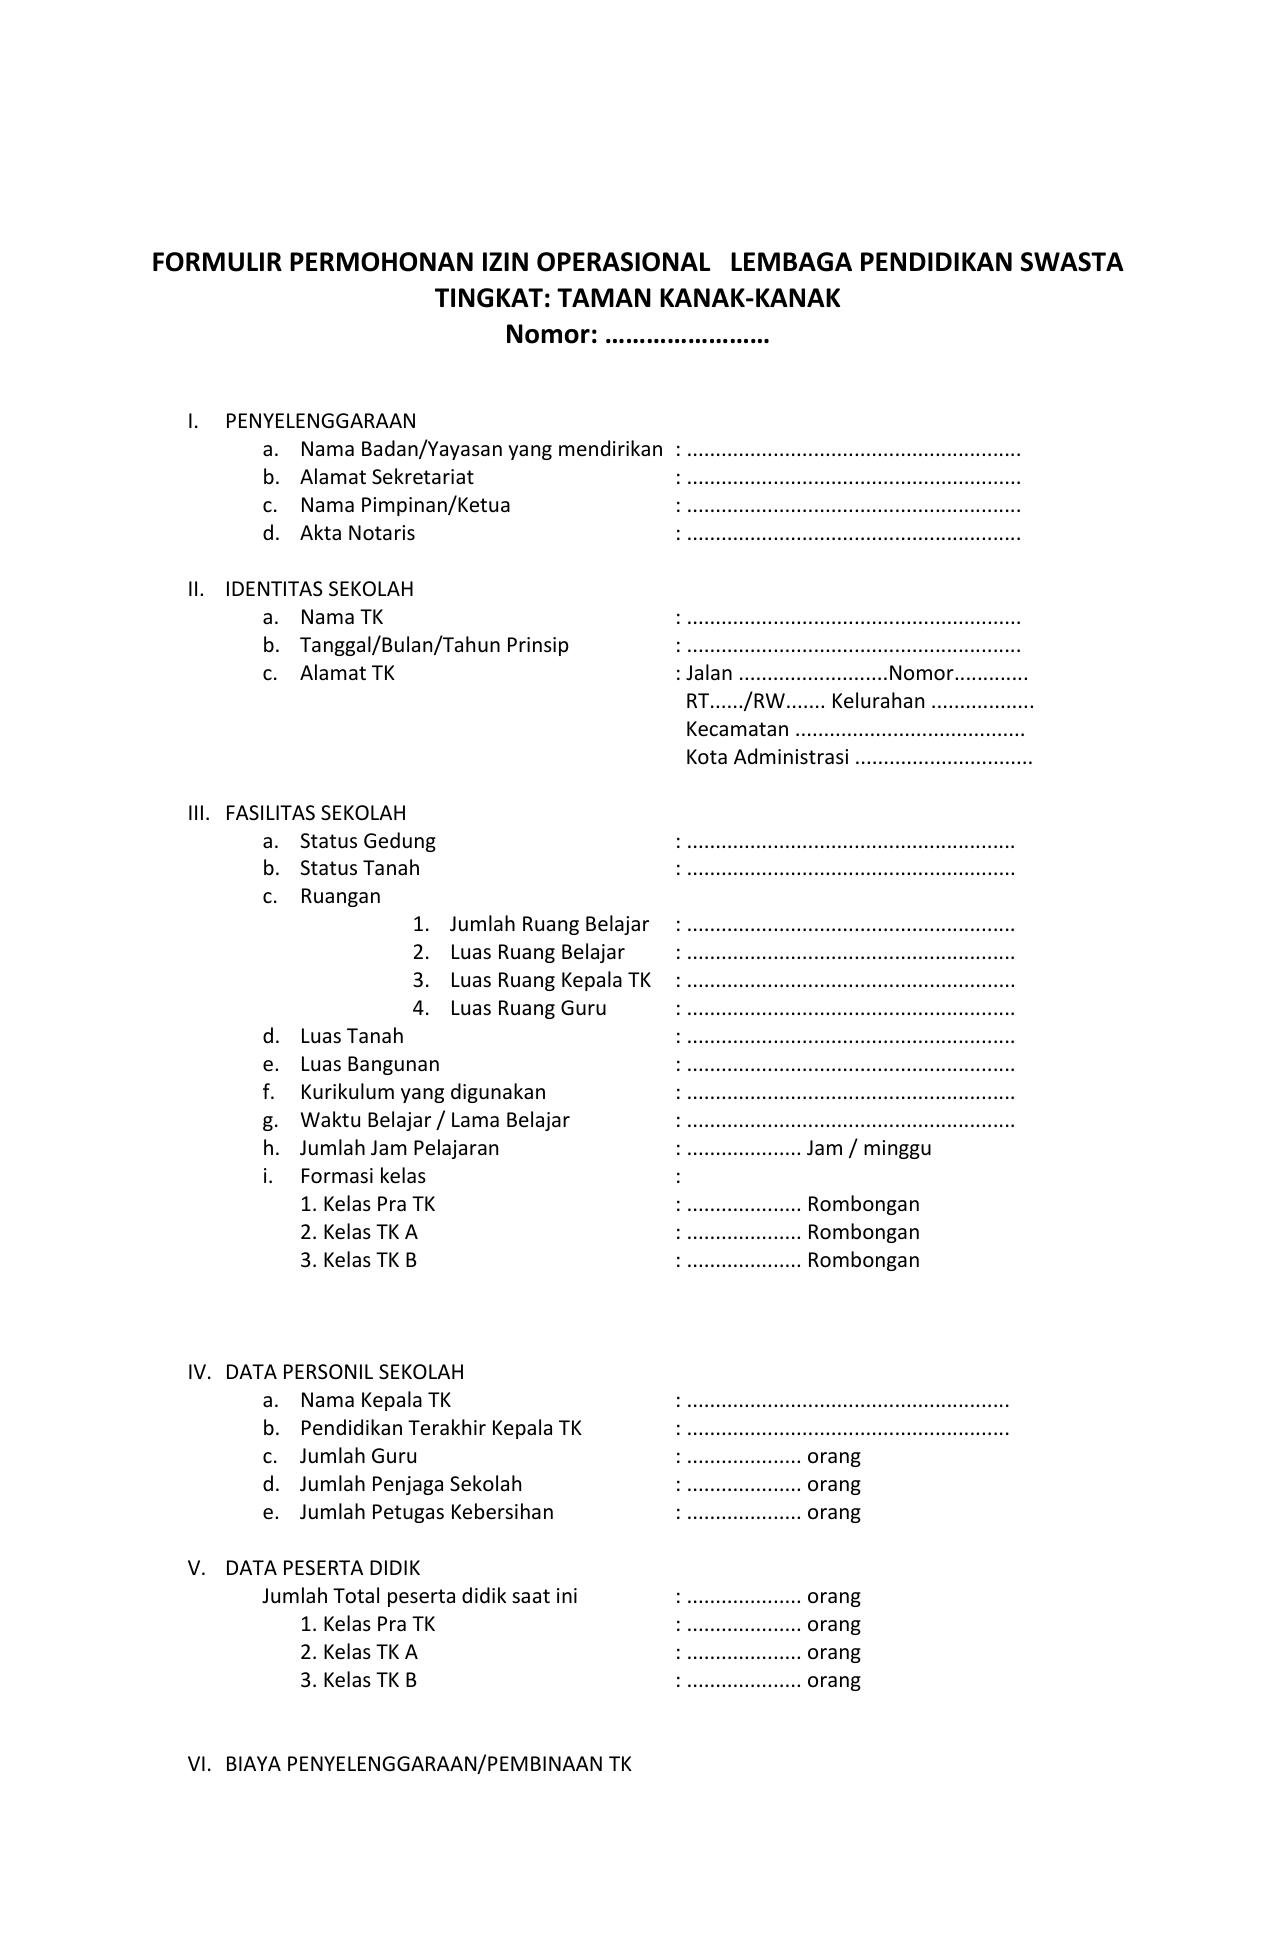 Formulir Permohonan Izin Operasional Lembaga